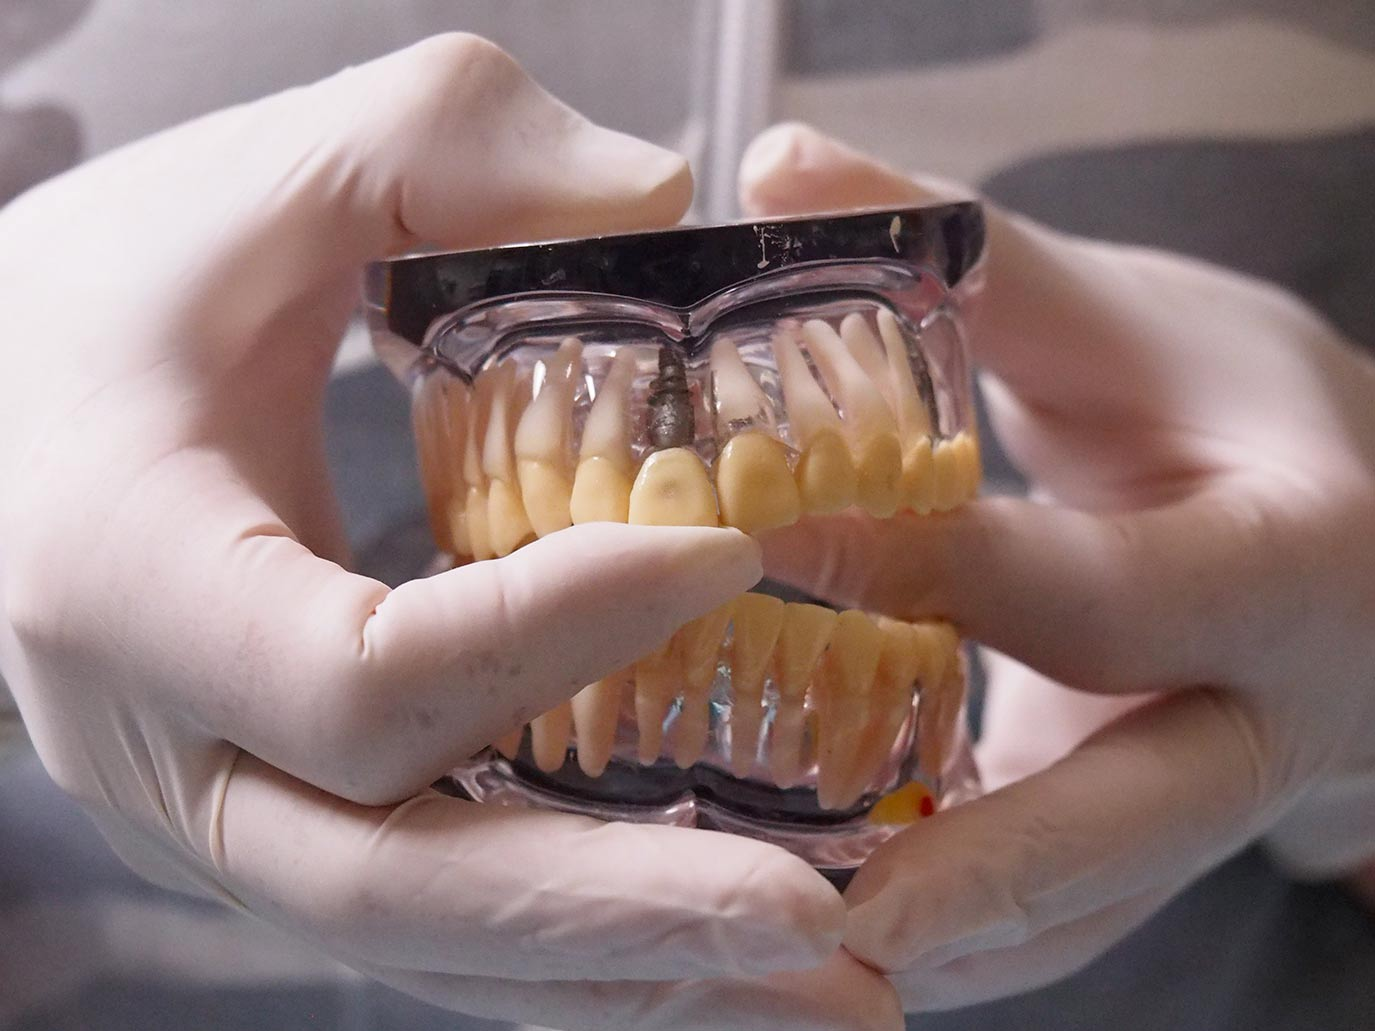 Implantologia - Dott.ssa Rosita Pascale | RP Odontoiatria | Dentista Castel San Giovanni